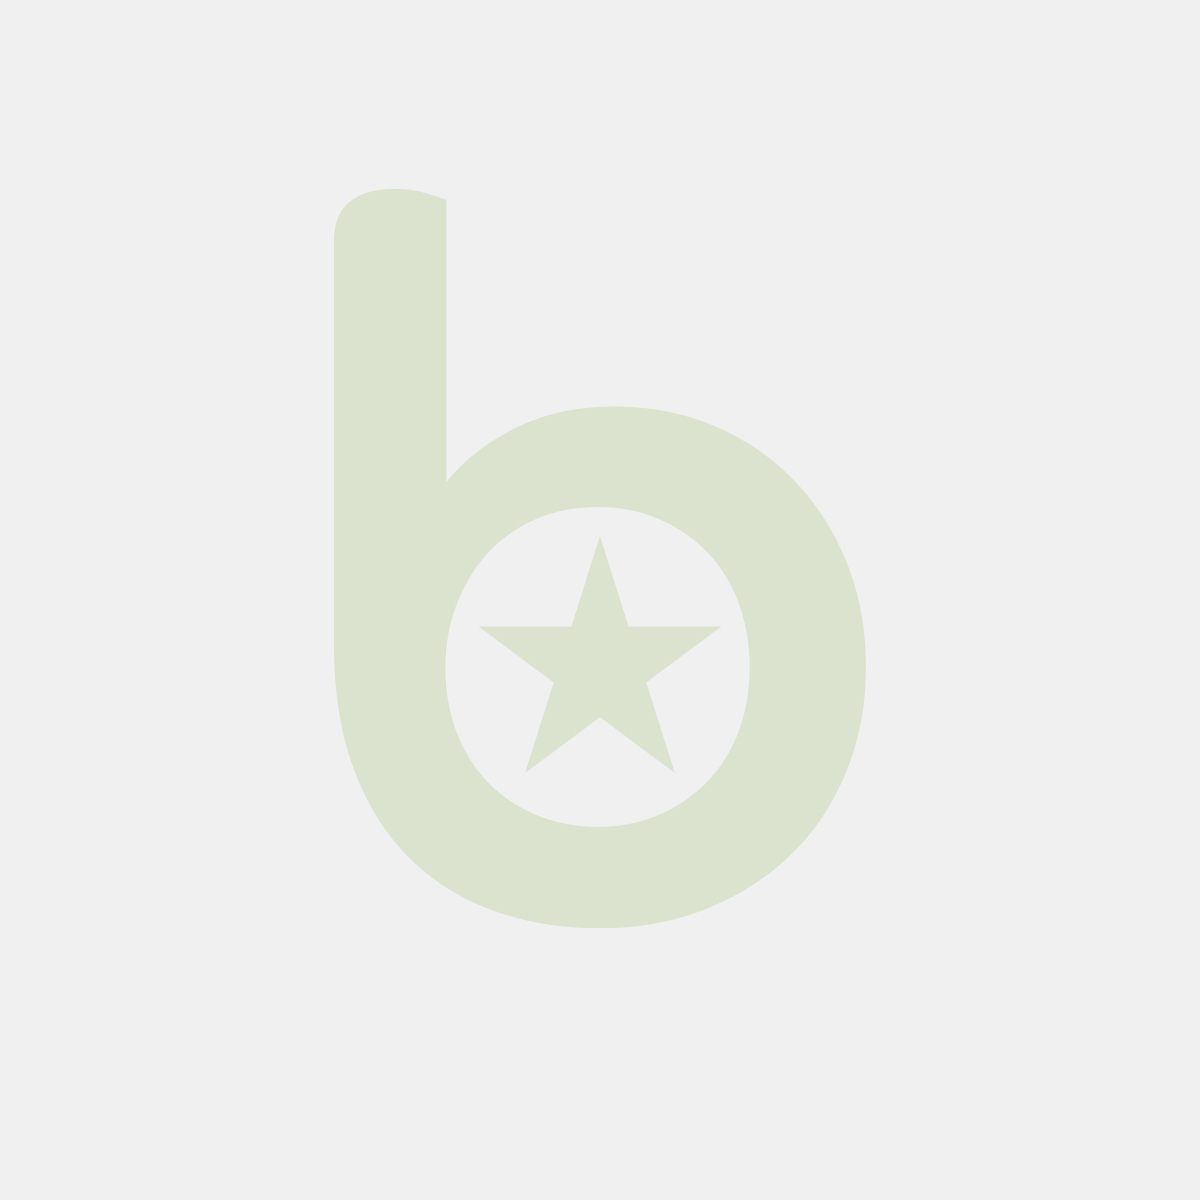 Waga biurowa na listy Optimo 5000 do 5 kg 90128